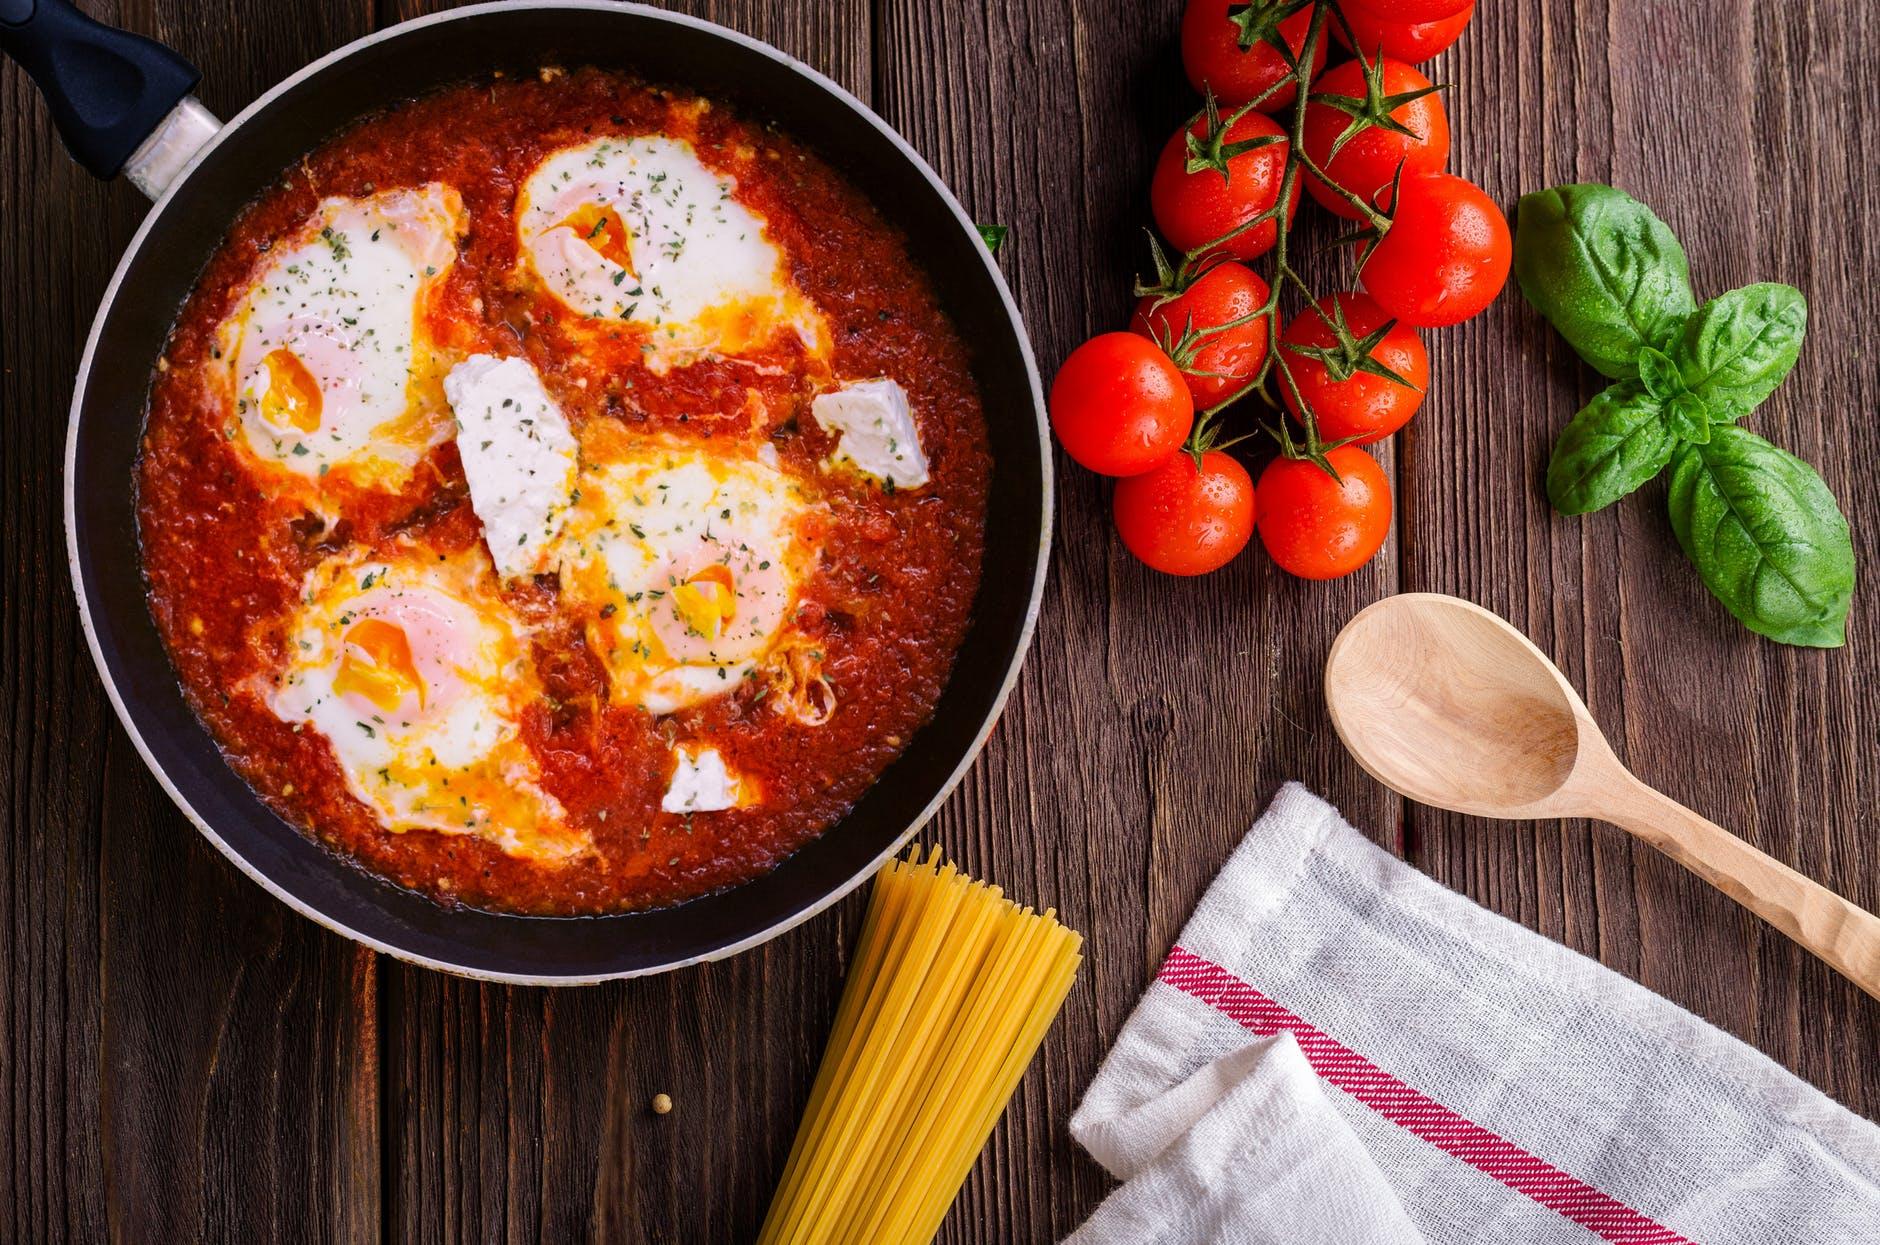 Aliment benefic pentru sanatatea ta! Nutritionist: Protejeaza inima